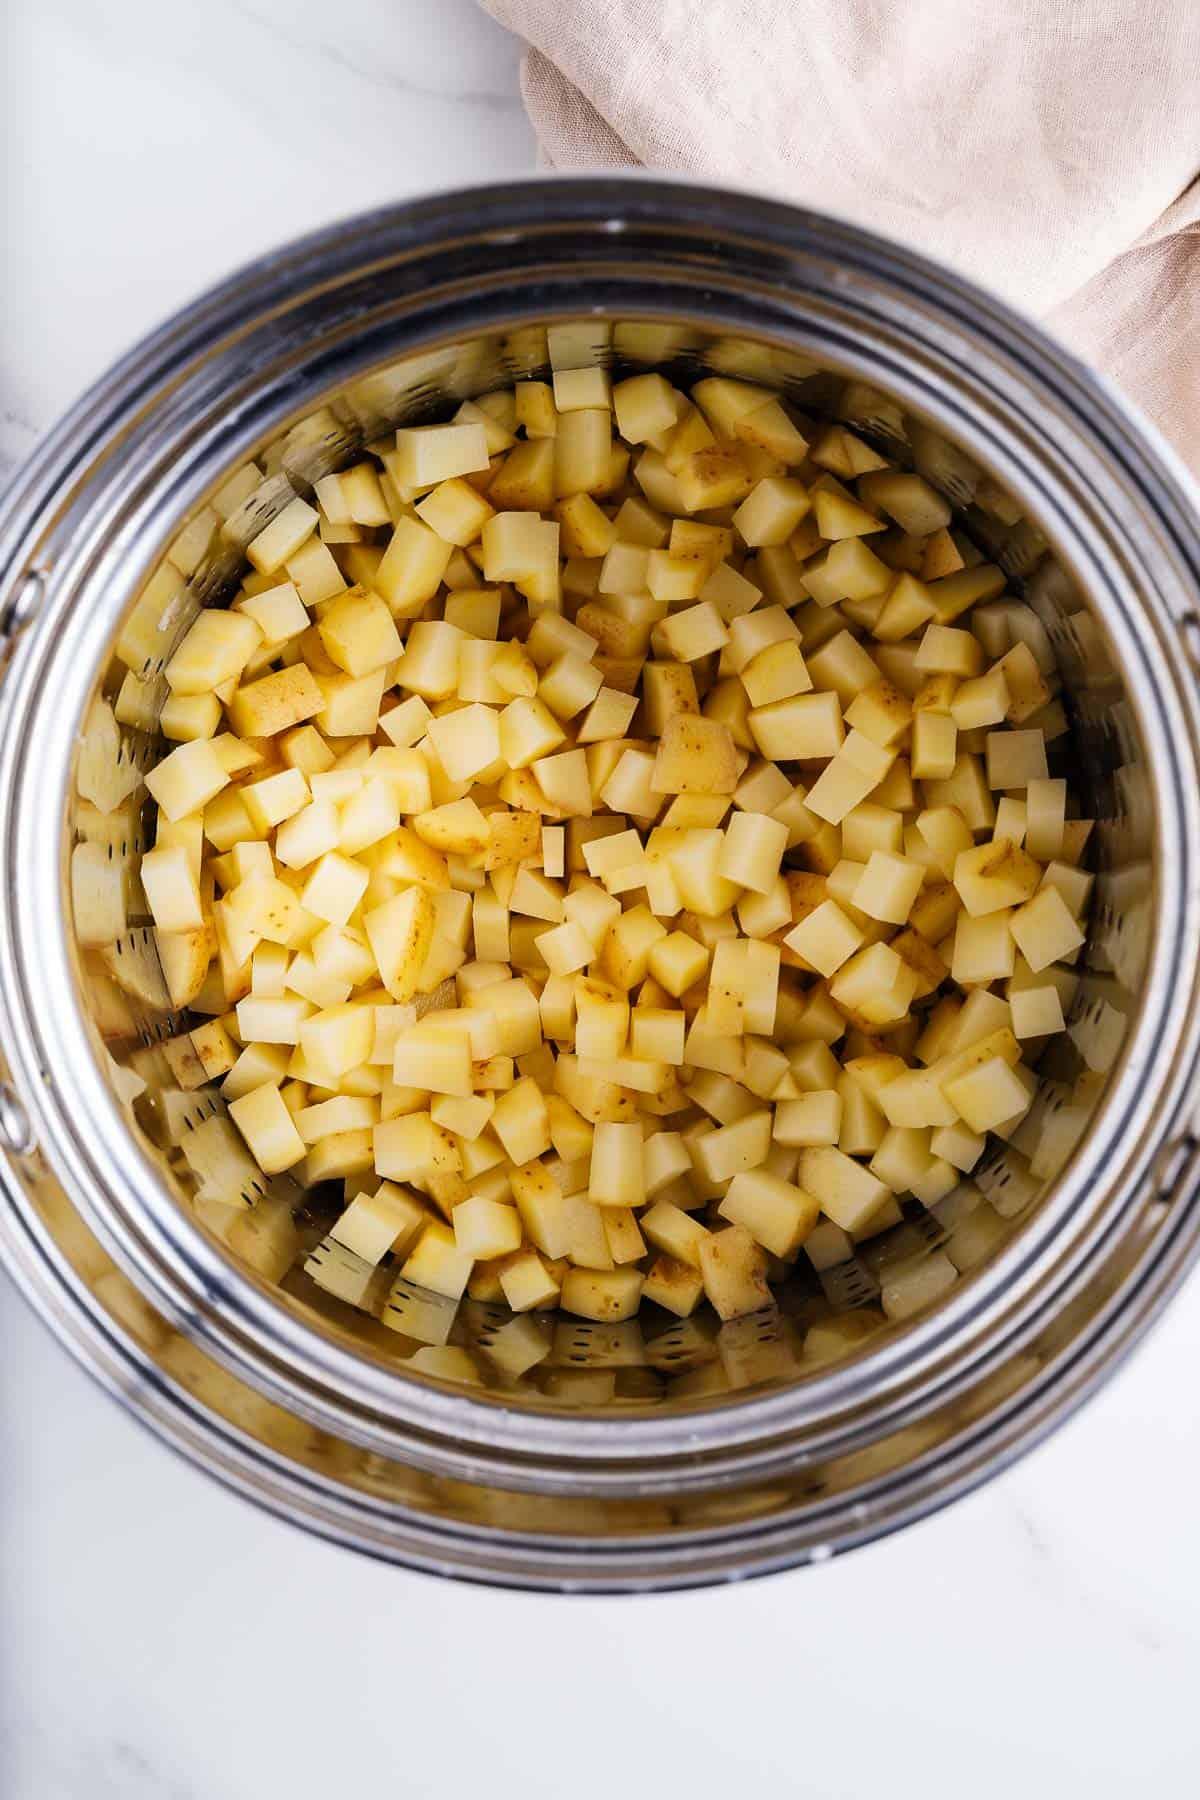 Potatoes in a Steamer